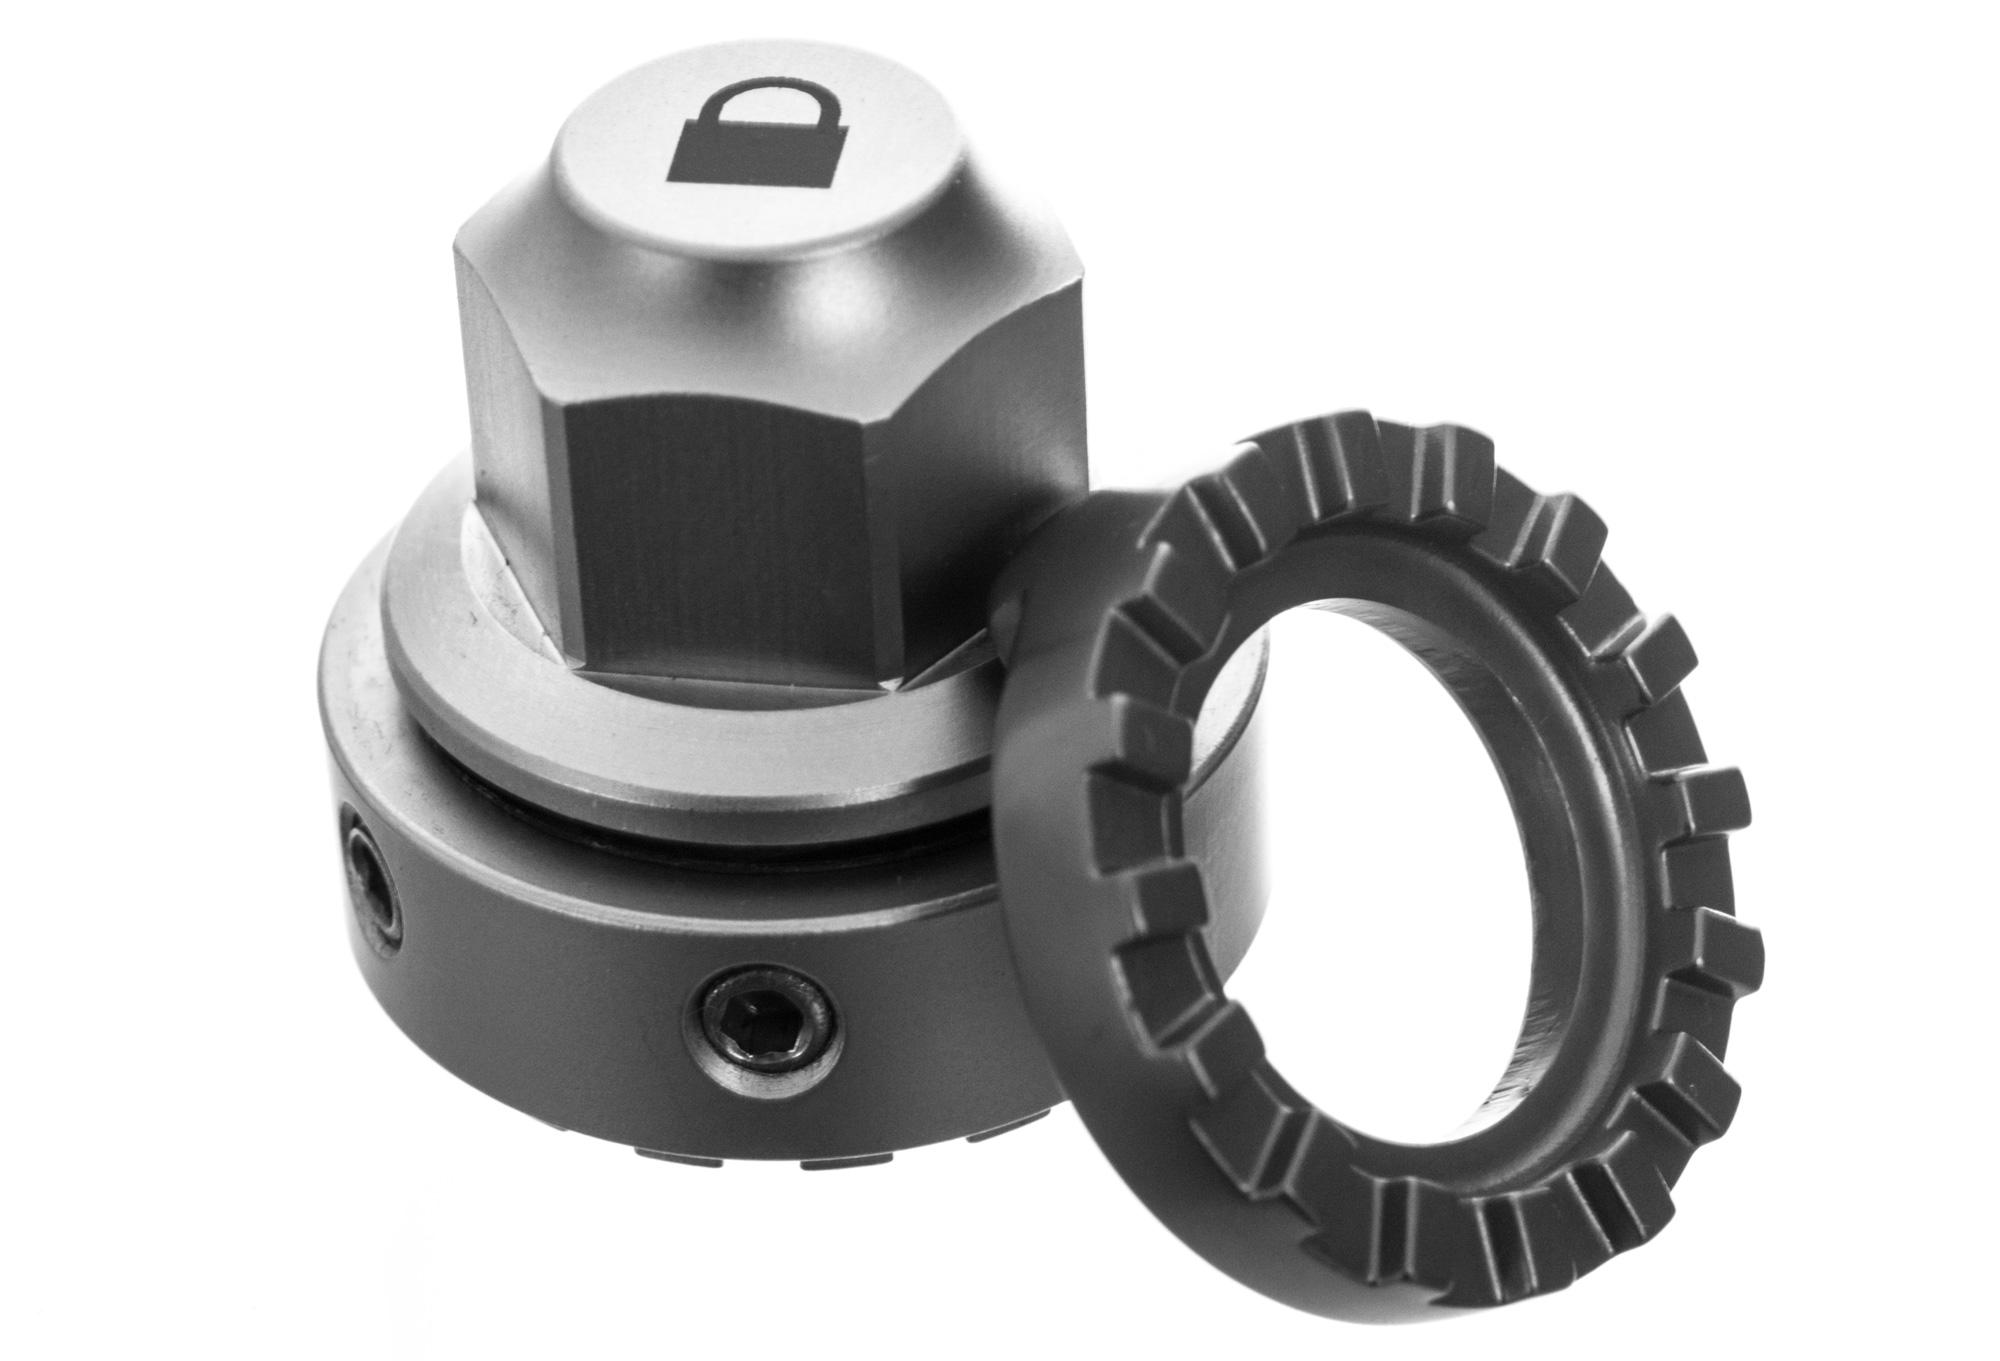 Wheel Nuts anti theft IXOW Wheelguard Gravity